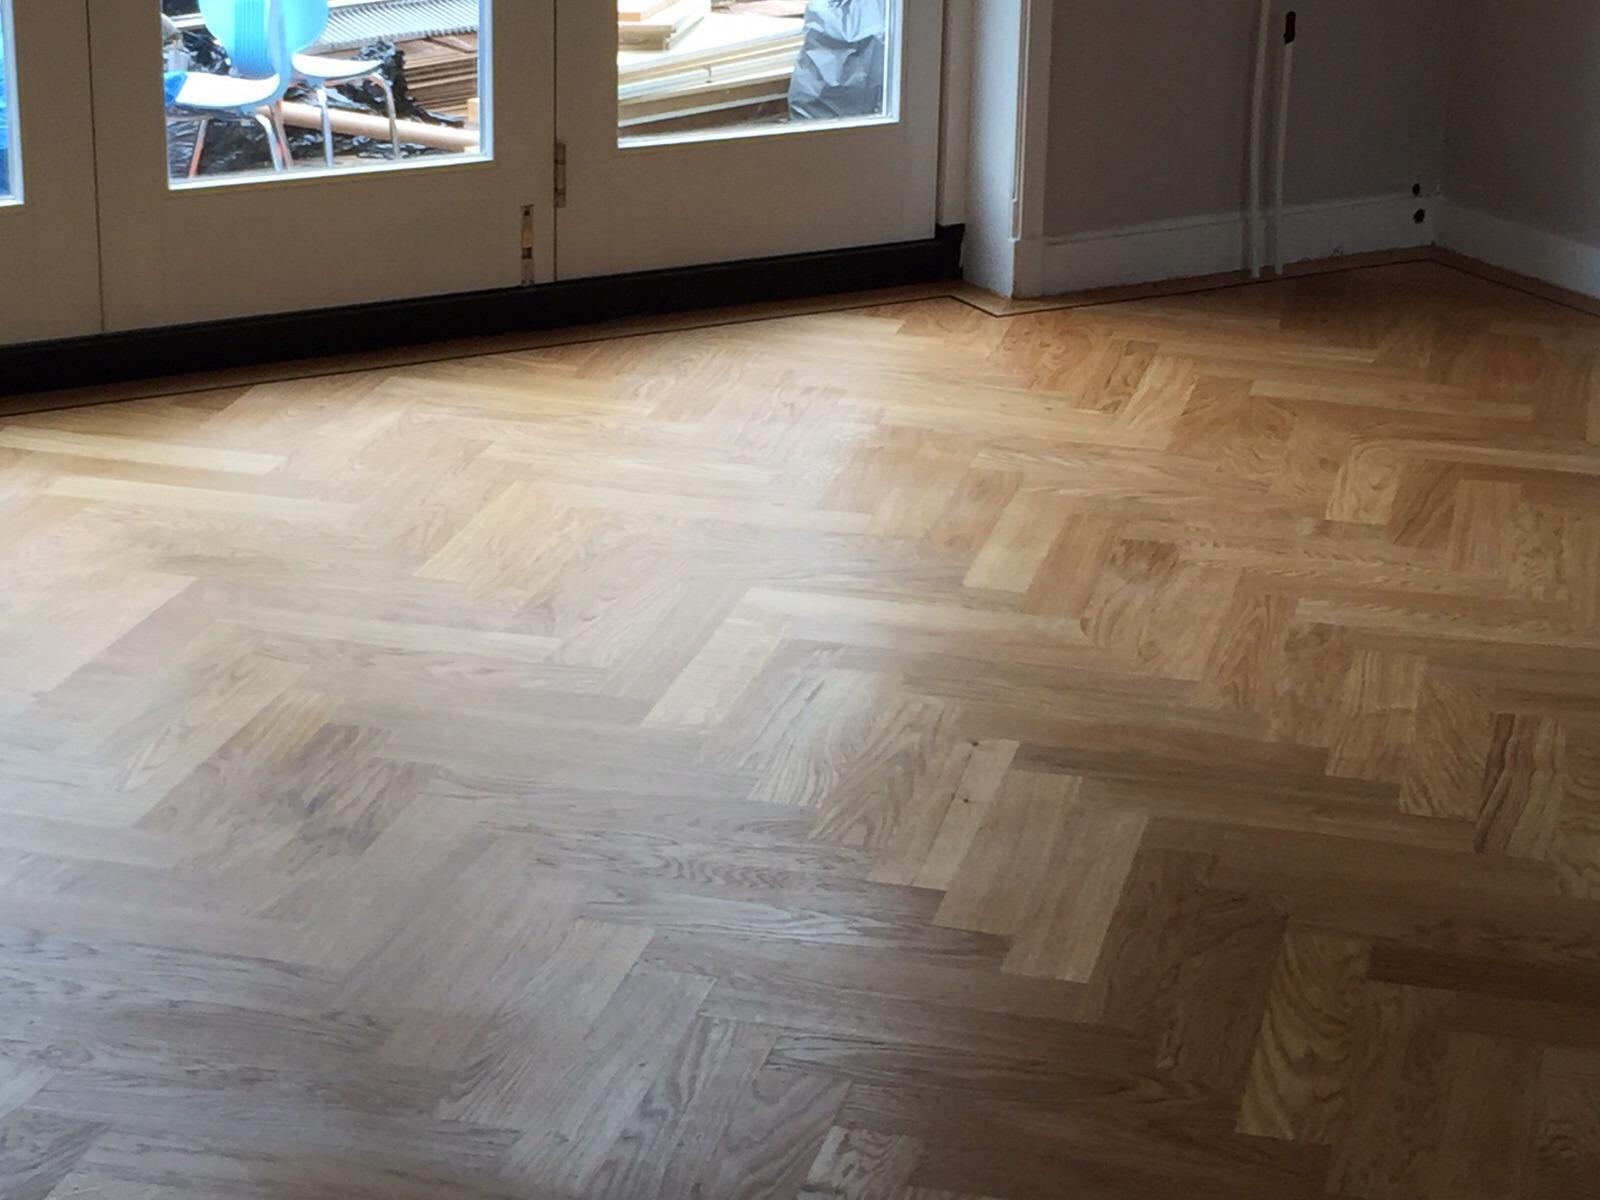 Houten Vloeren Arnhem : Visgraat vloer arnhem visgraatvloer